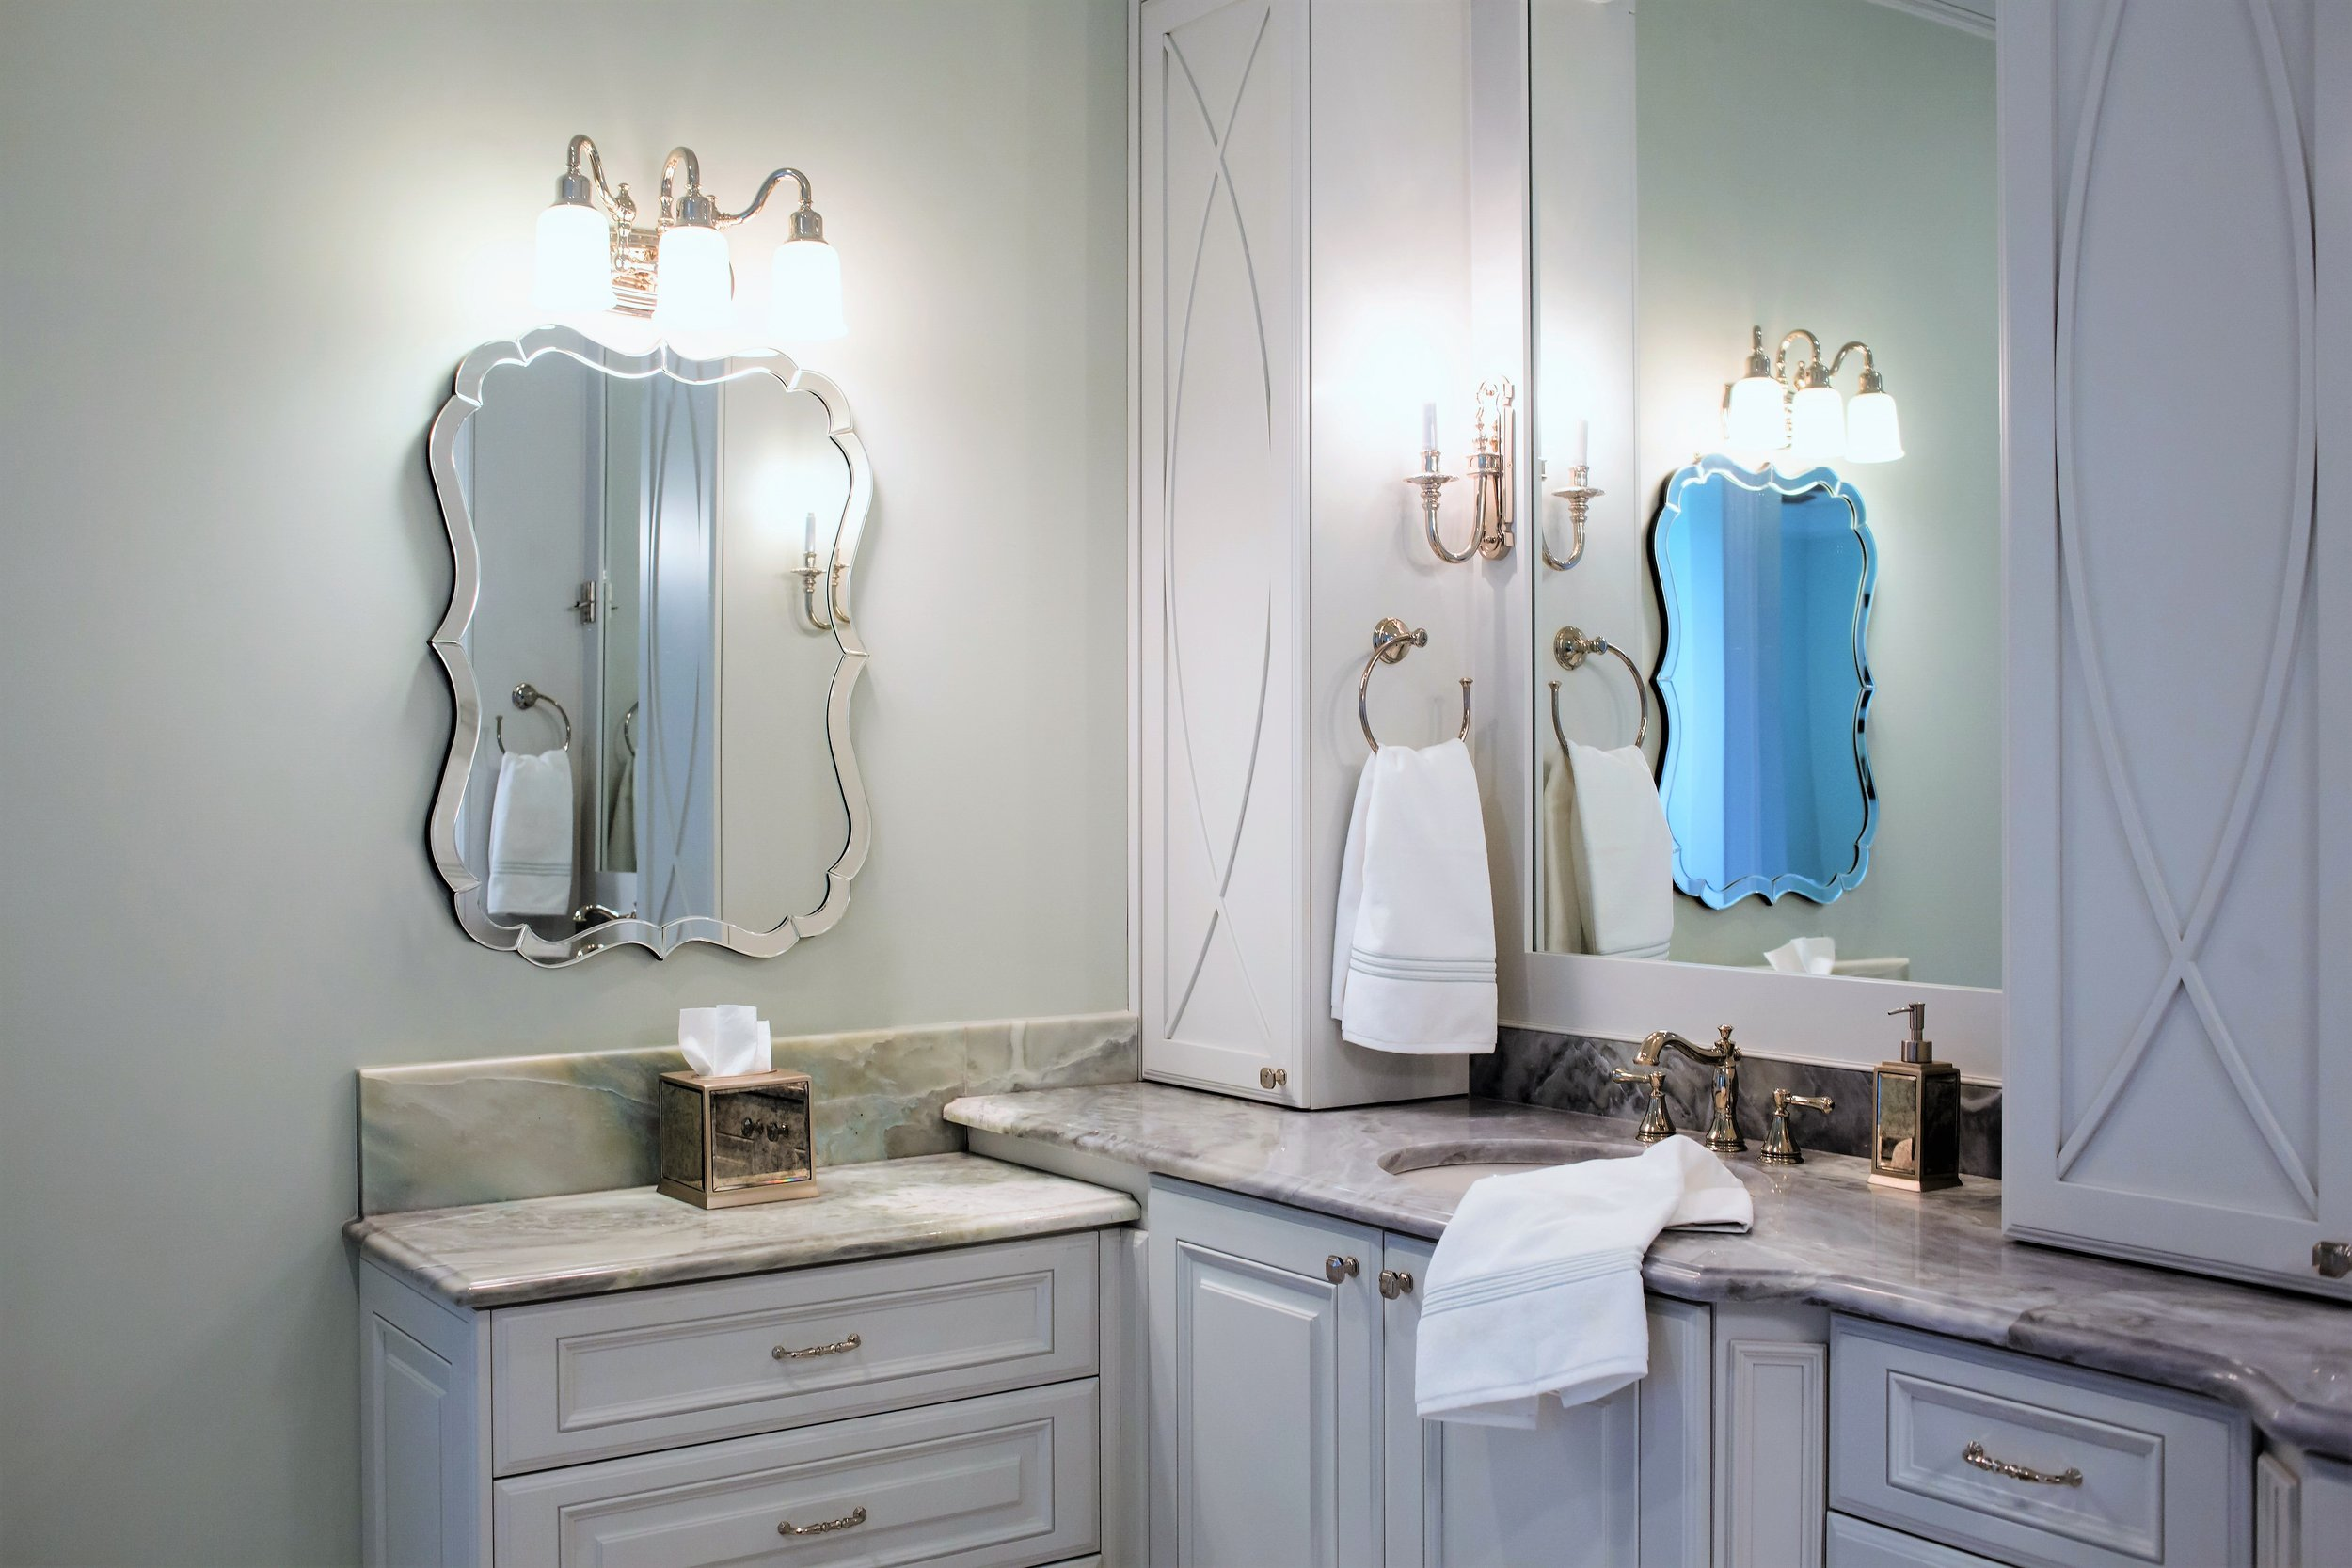 ellebrightdesigns.corner.masterbathroom.celadon